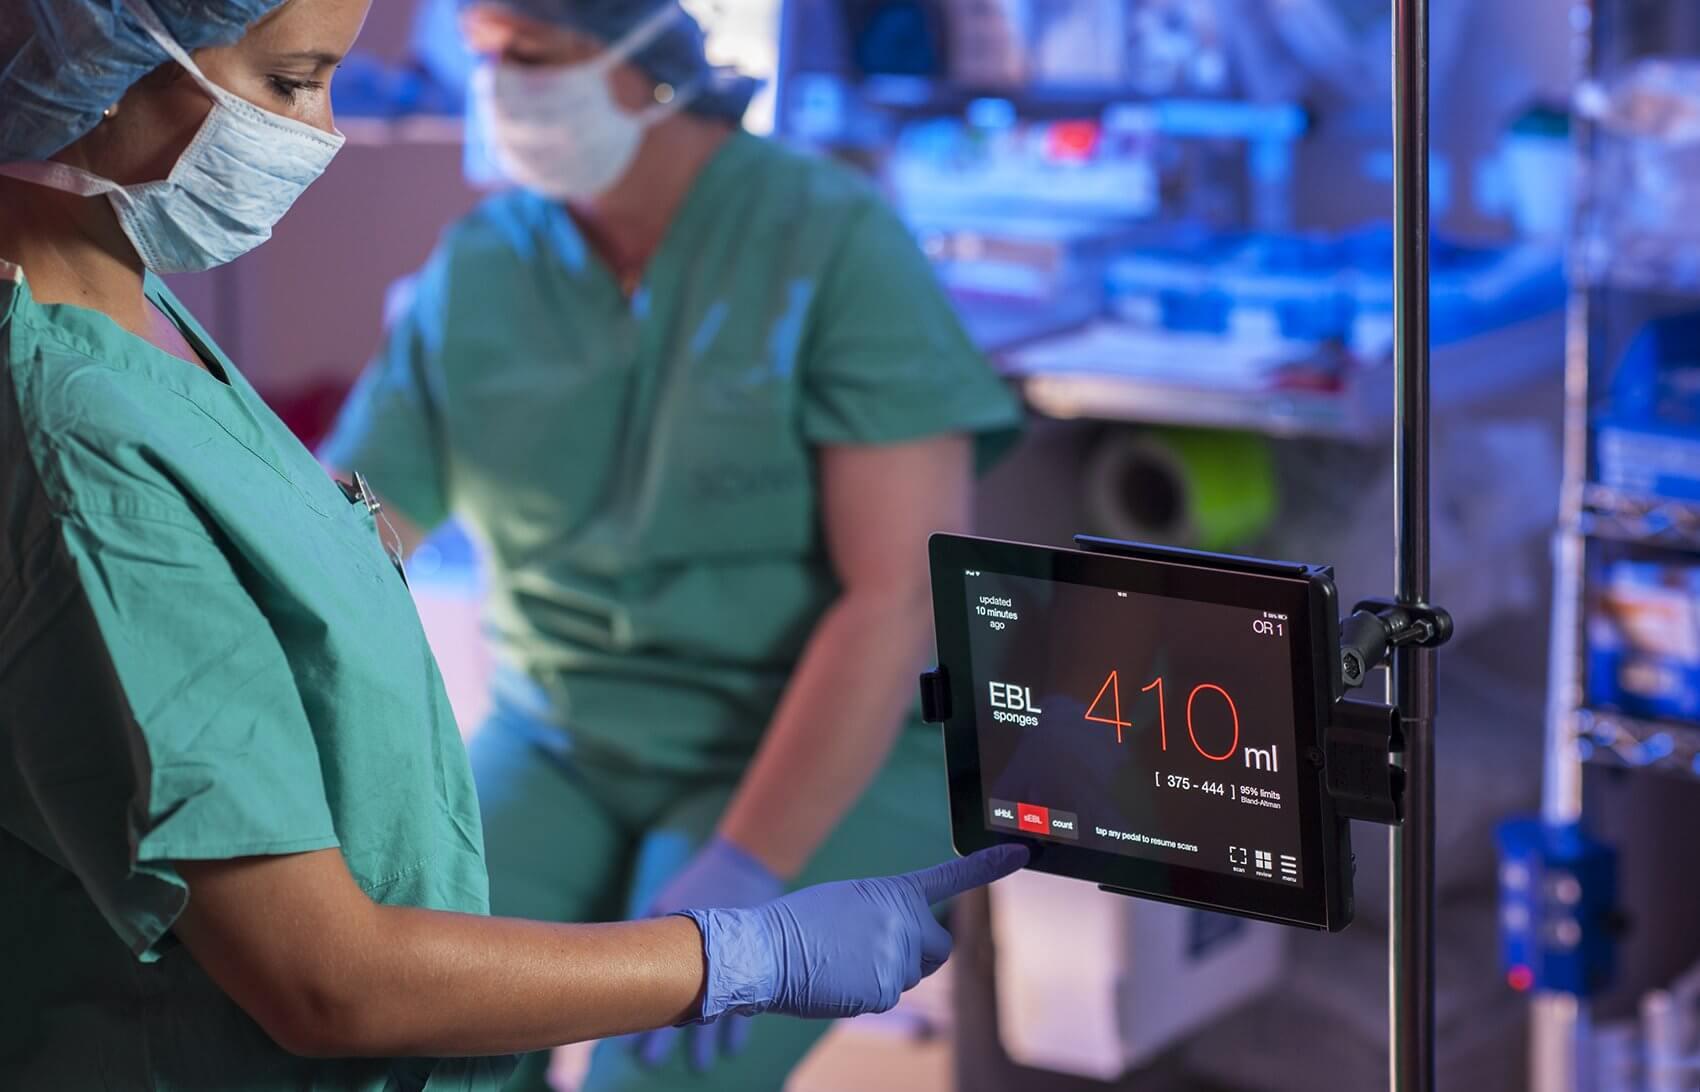 Triton's interface monitors and displays rapid, intraoperative estimated blood loss (EBL) in milliliters.